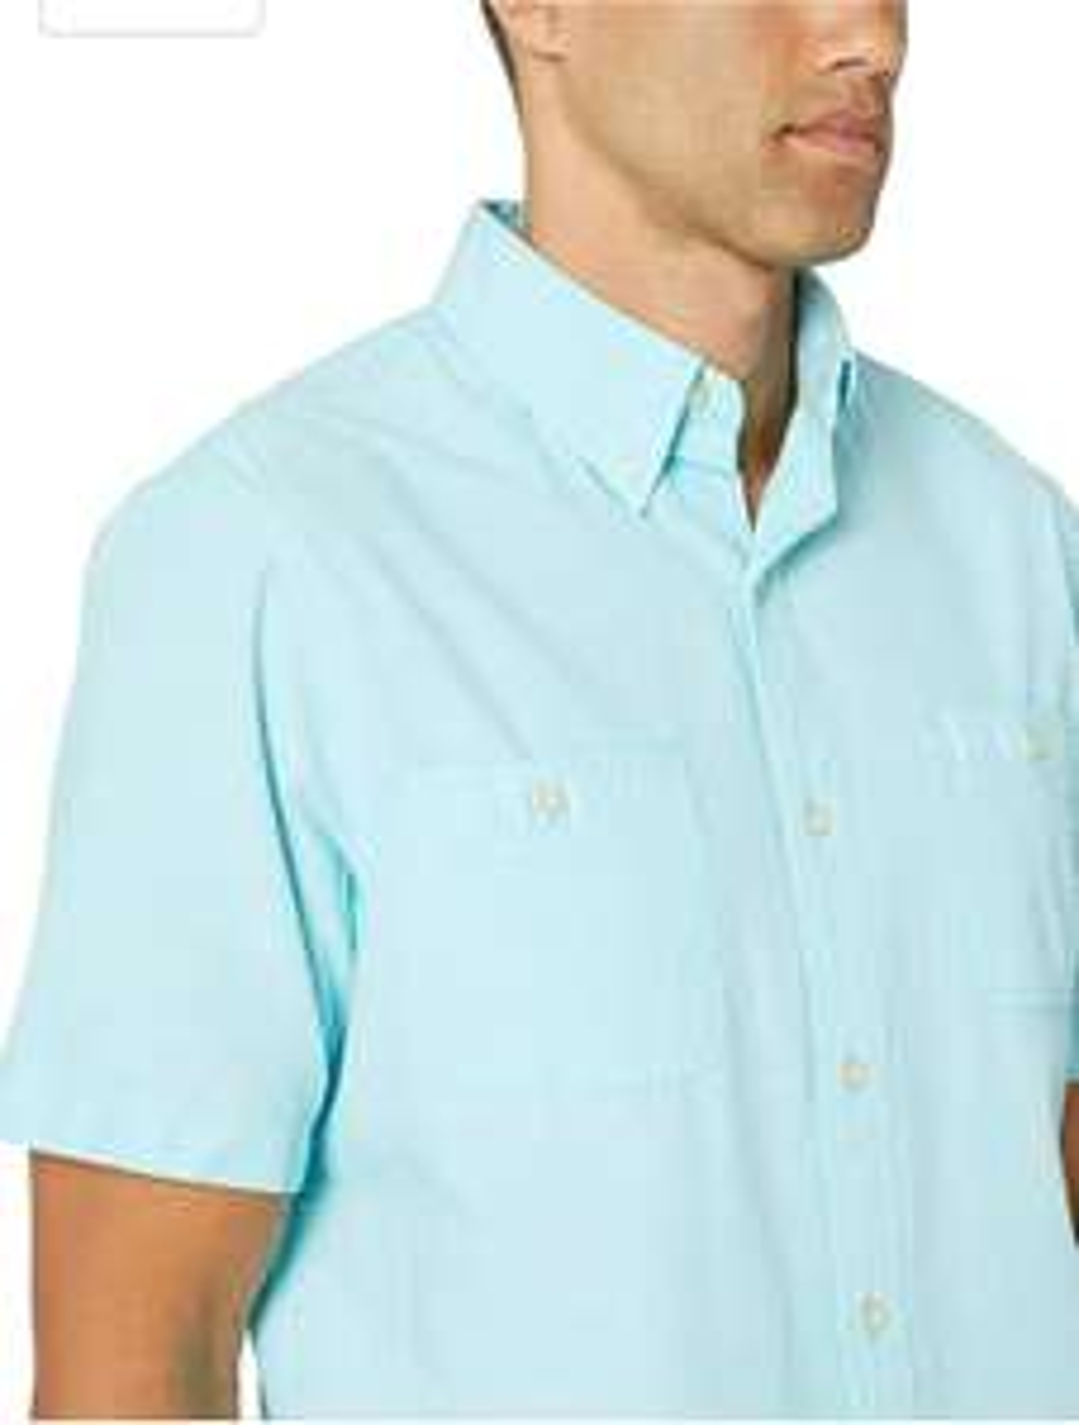 Amazon: Chaps Camisa de Manga Corta Chambray con Botones para Hombre Talla chica